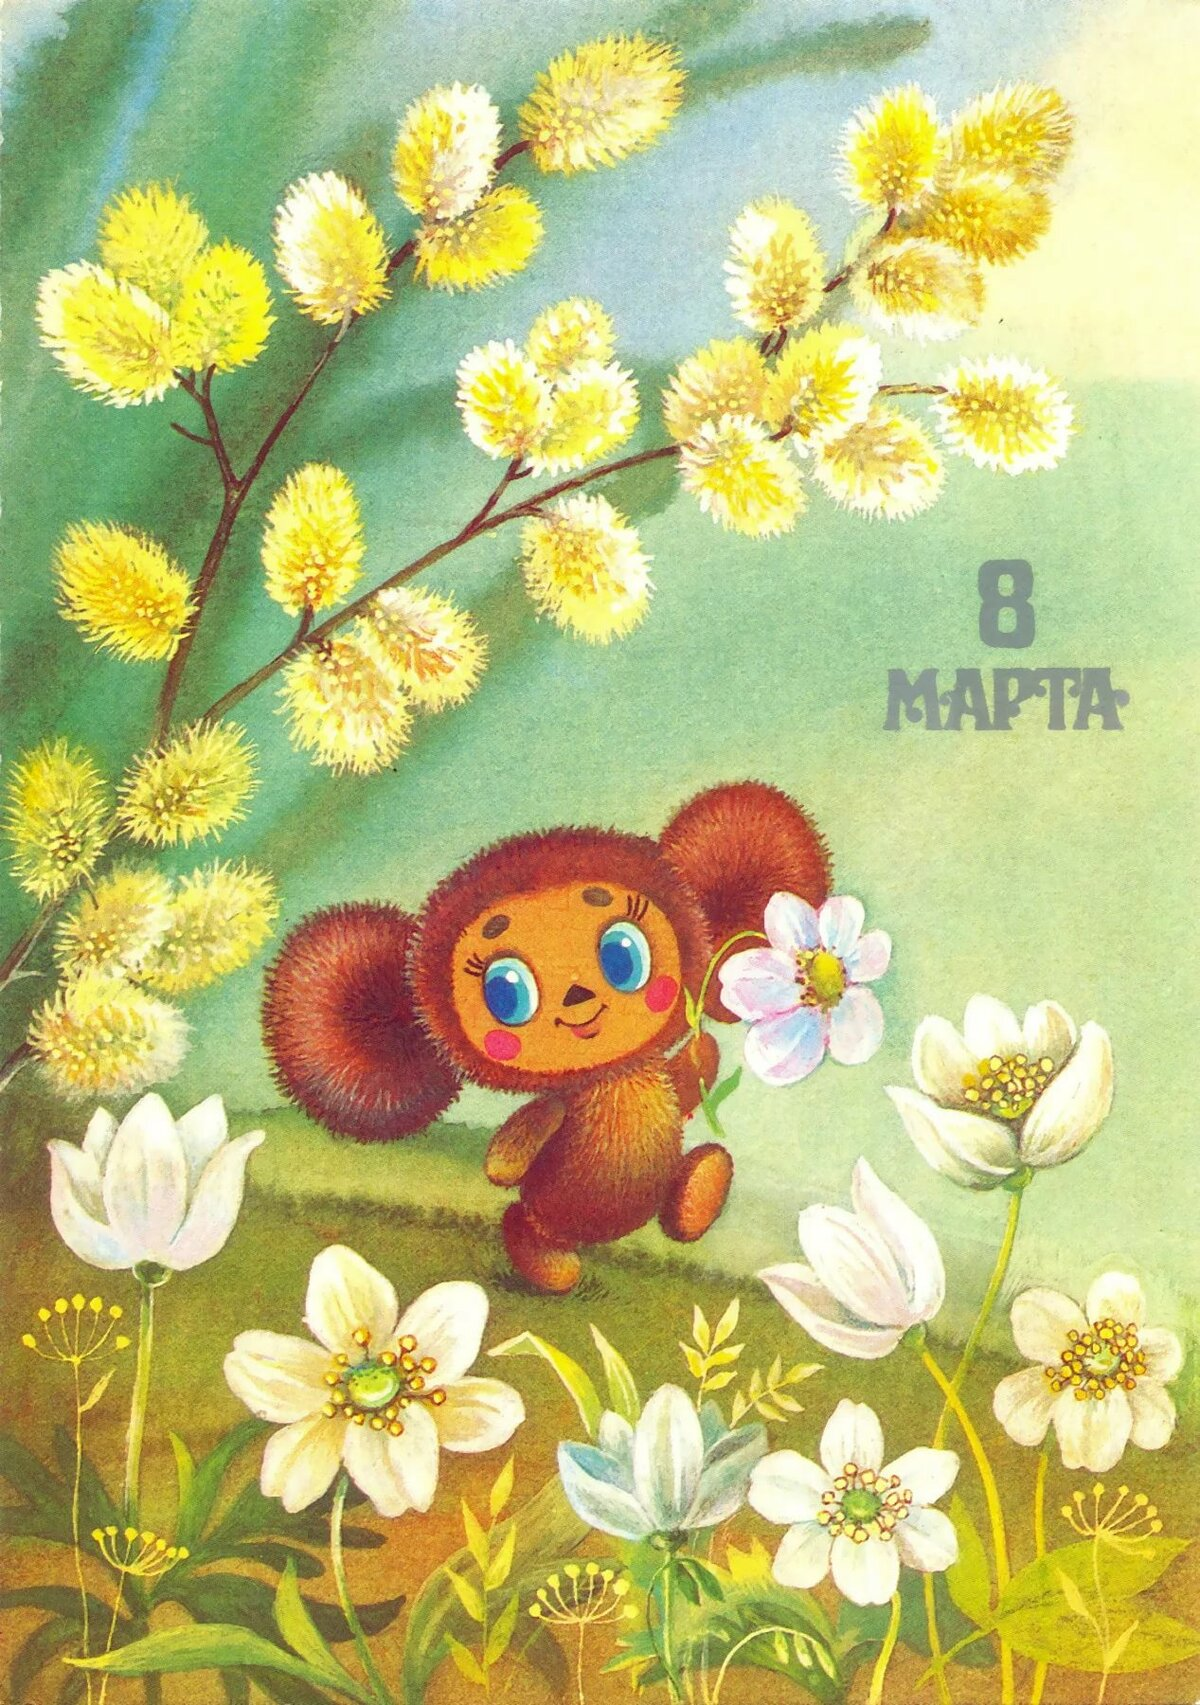 Весна открытки ссср, машине картинка картинки